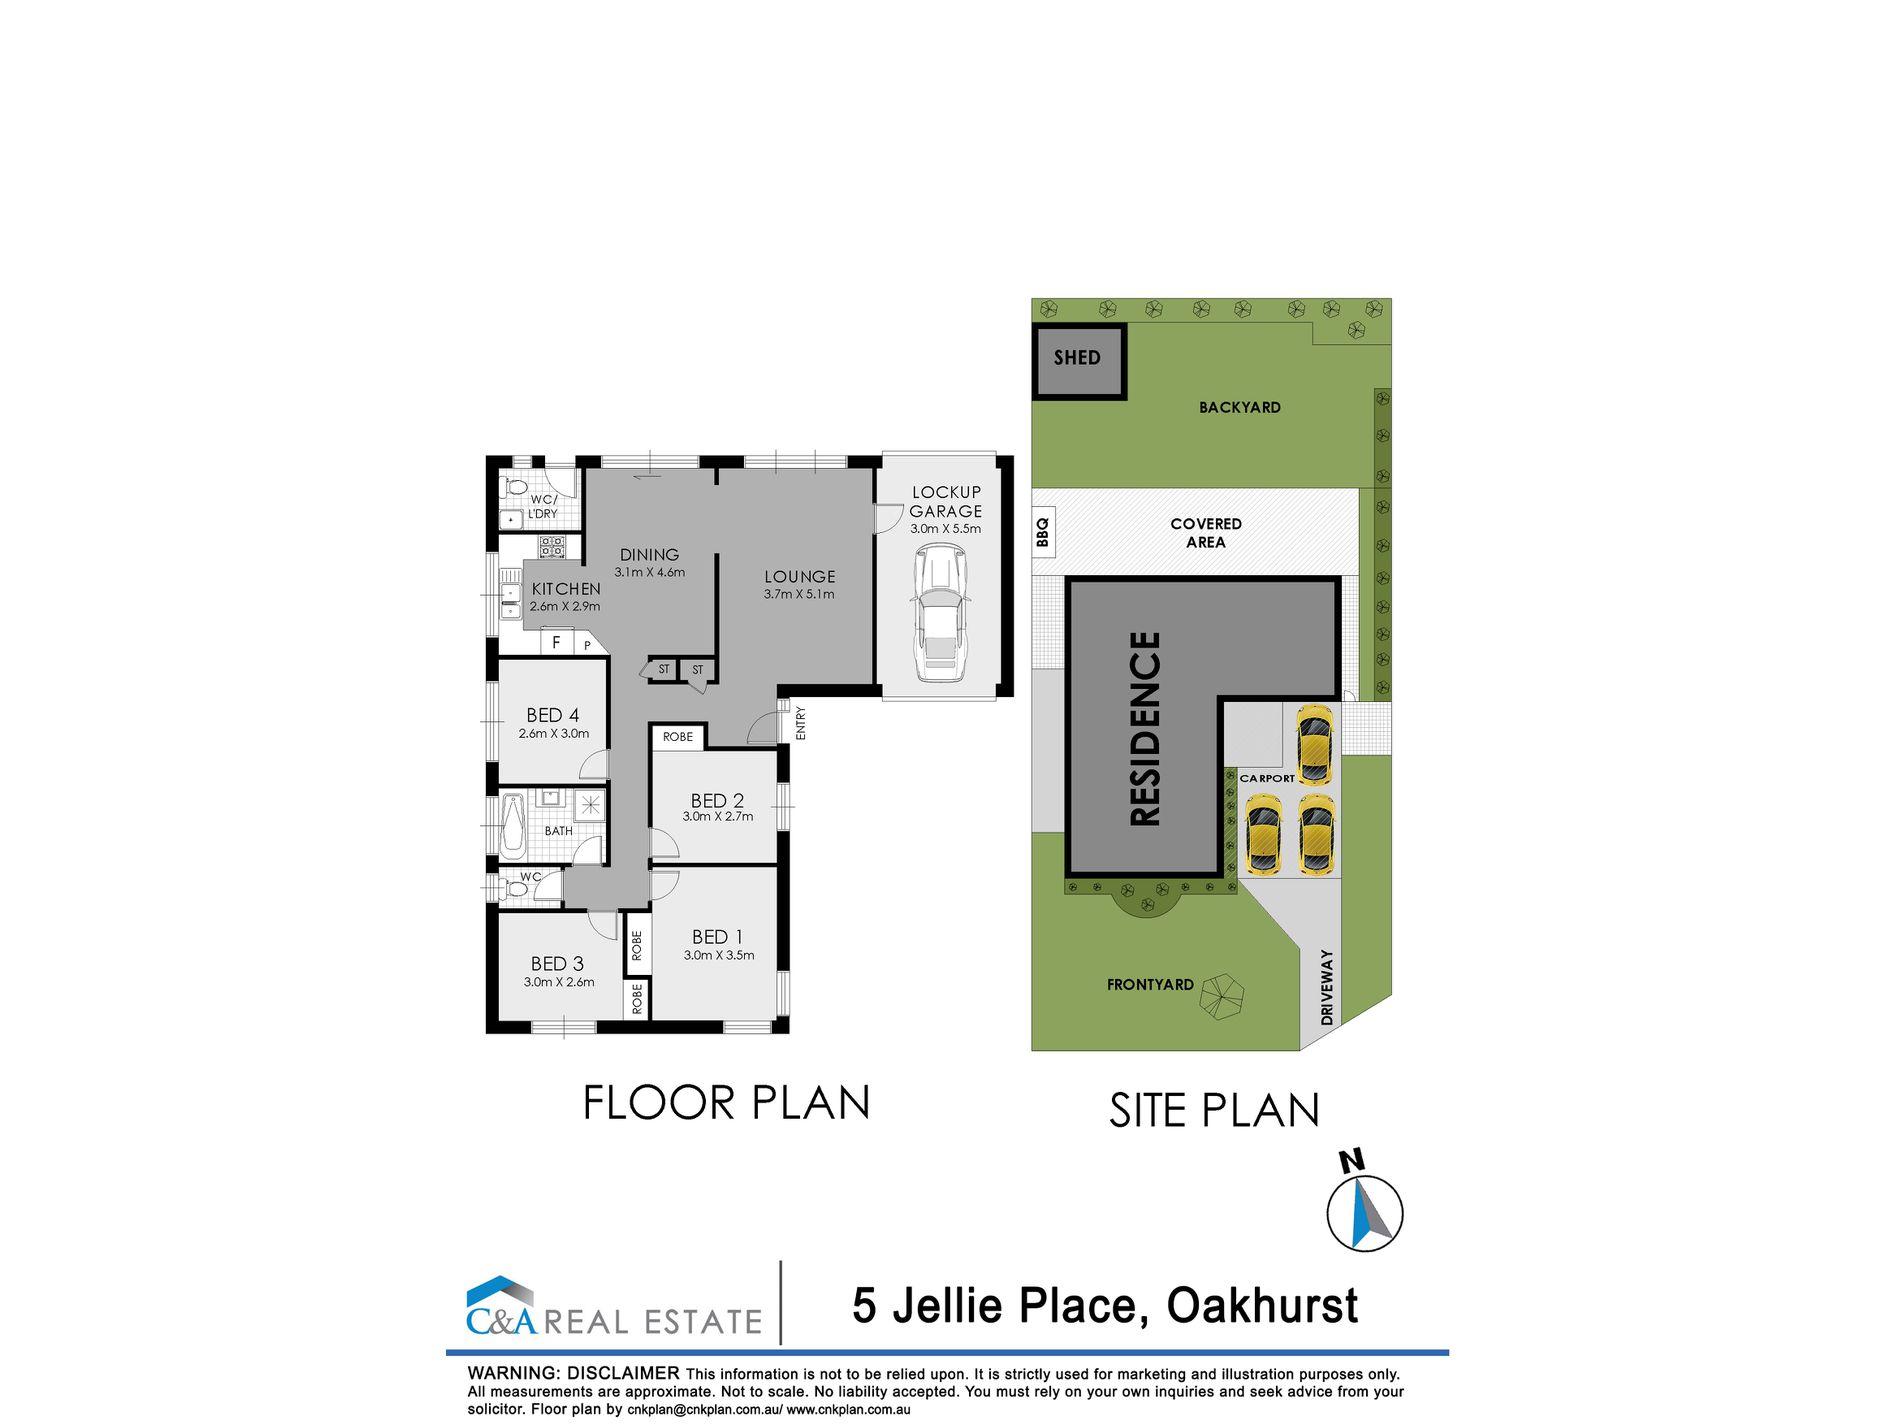 5 Jellie Place, Oakhurst